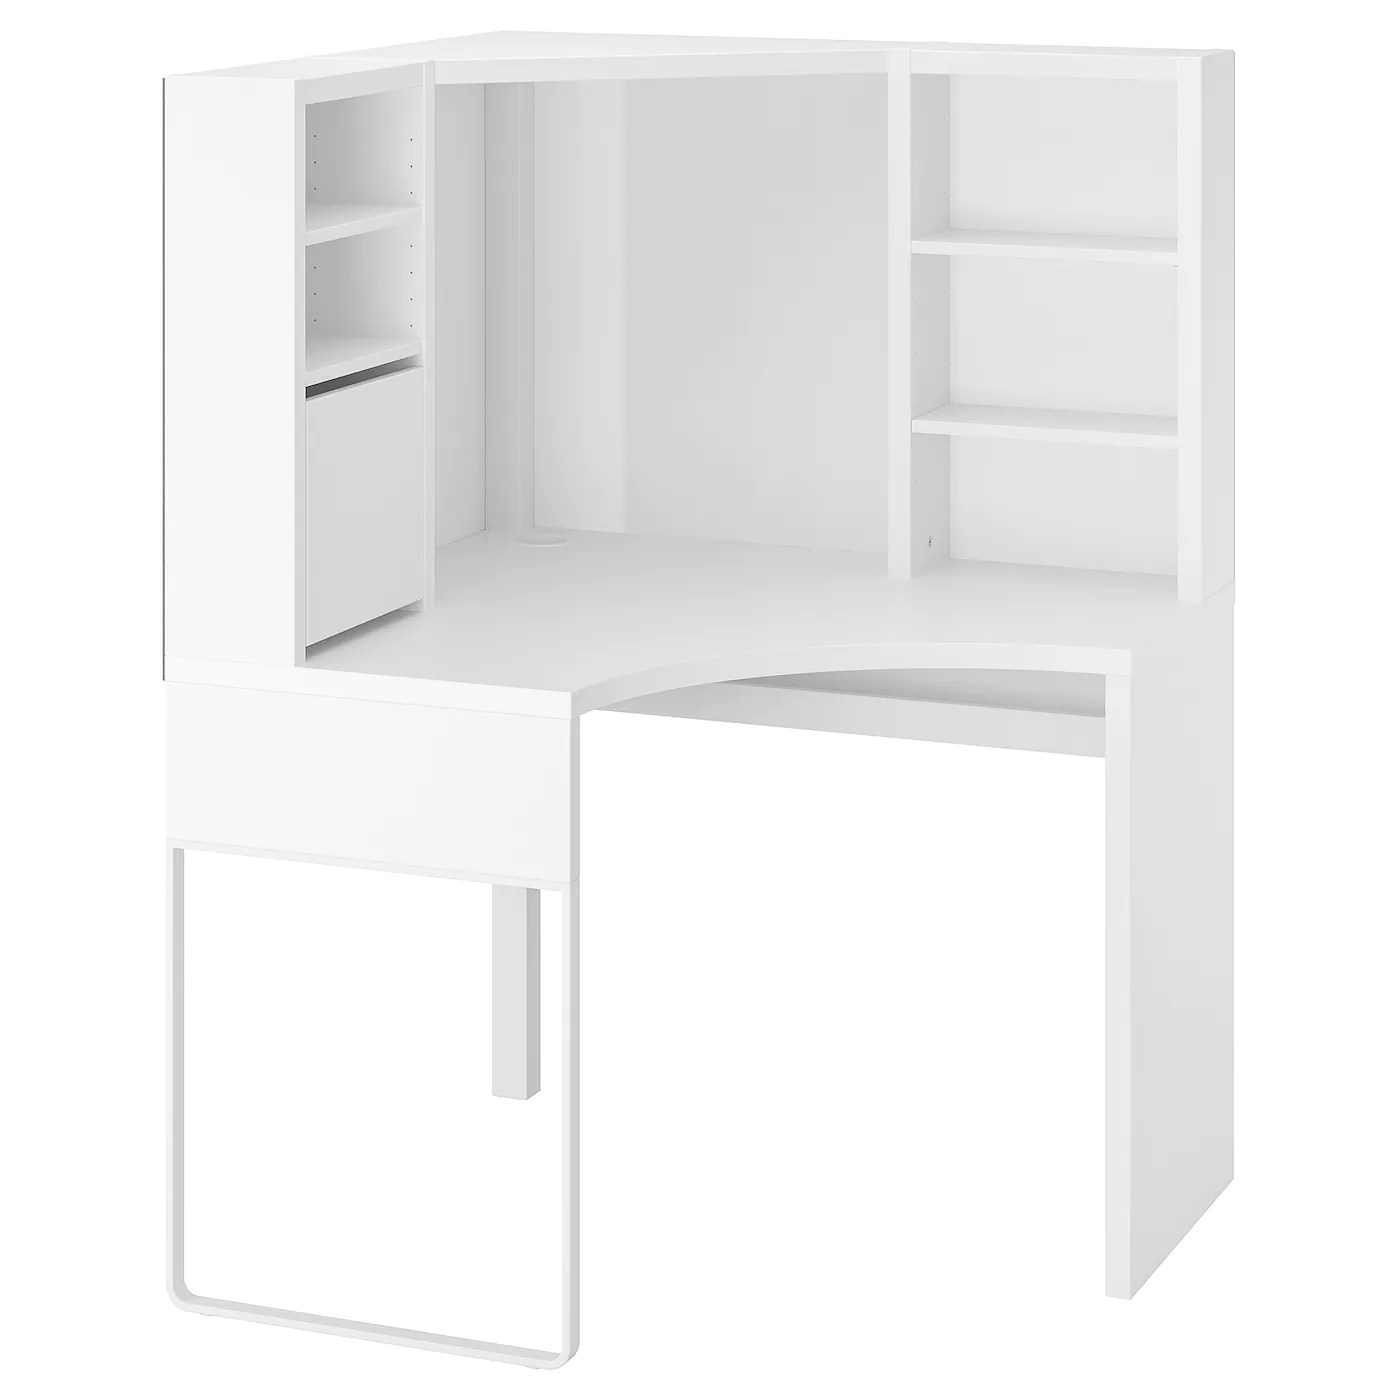 Micke Poste De Travail D Angle Blanc 100x141 Cm Ikea